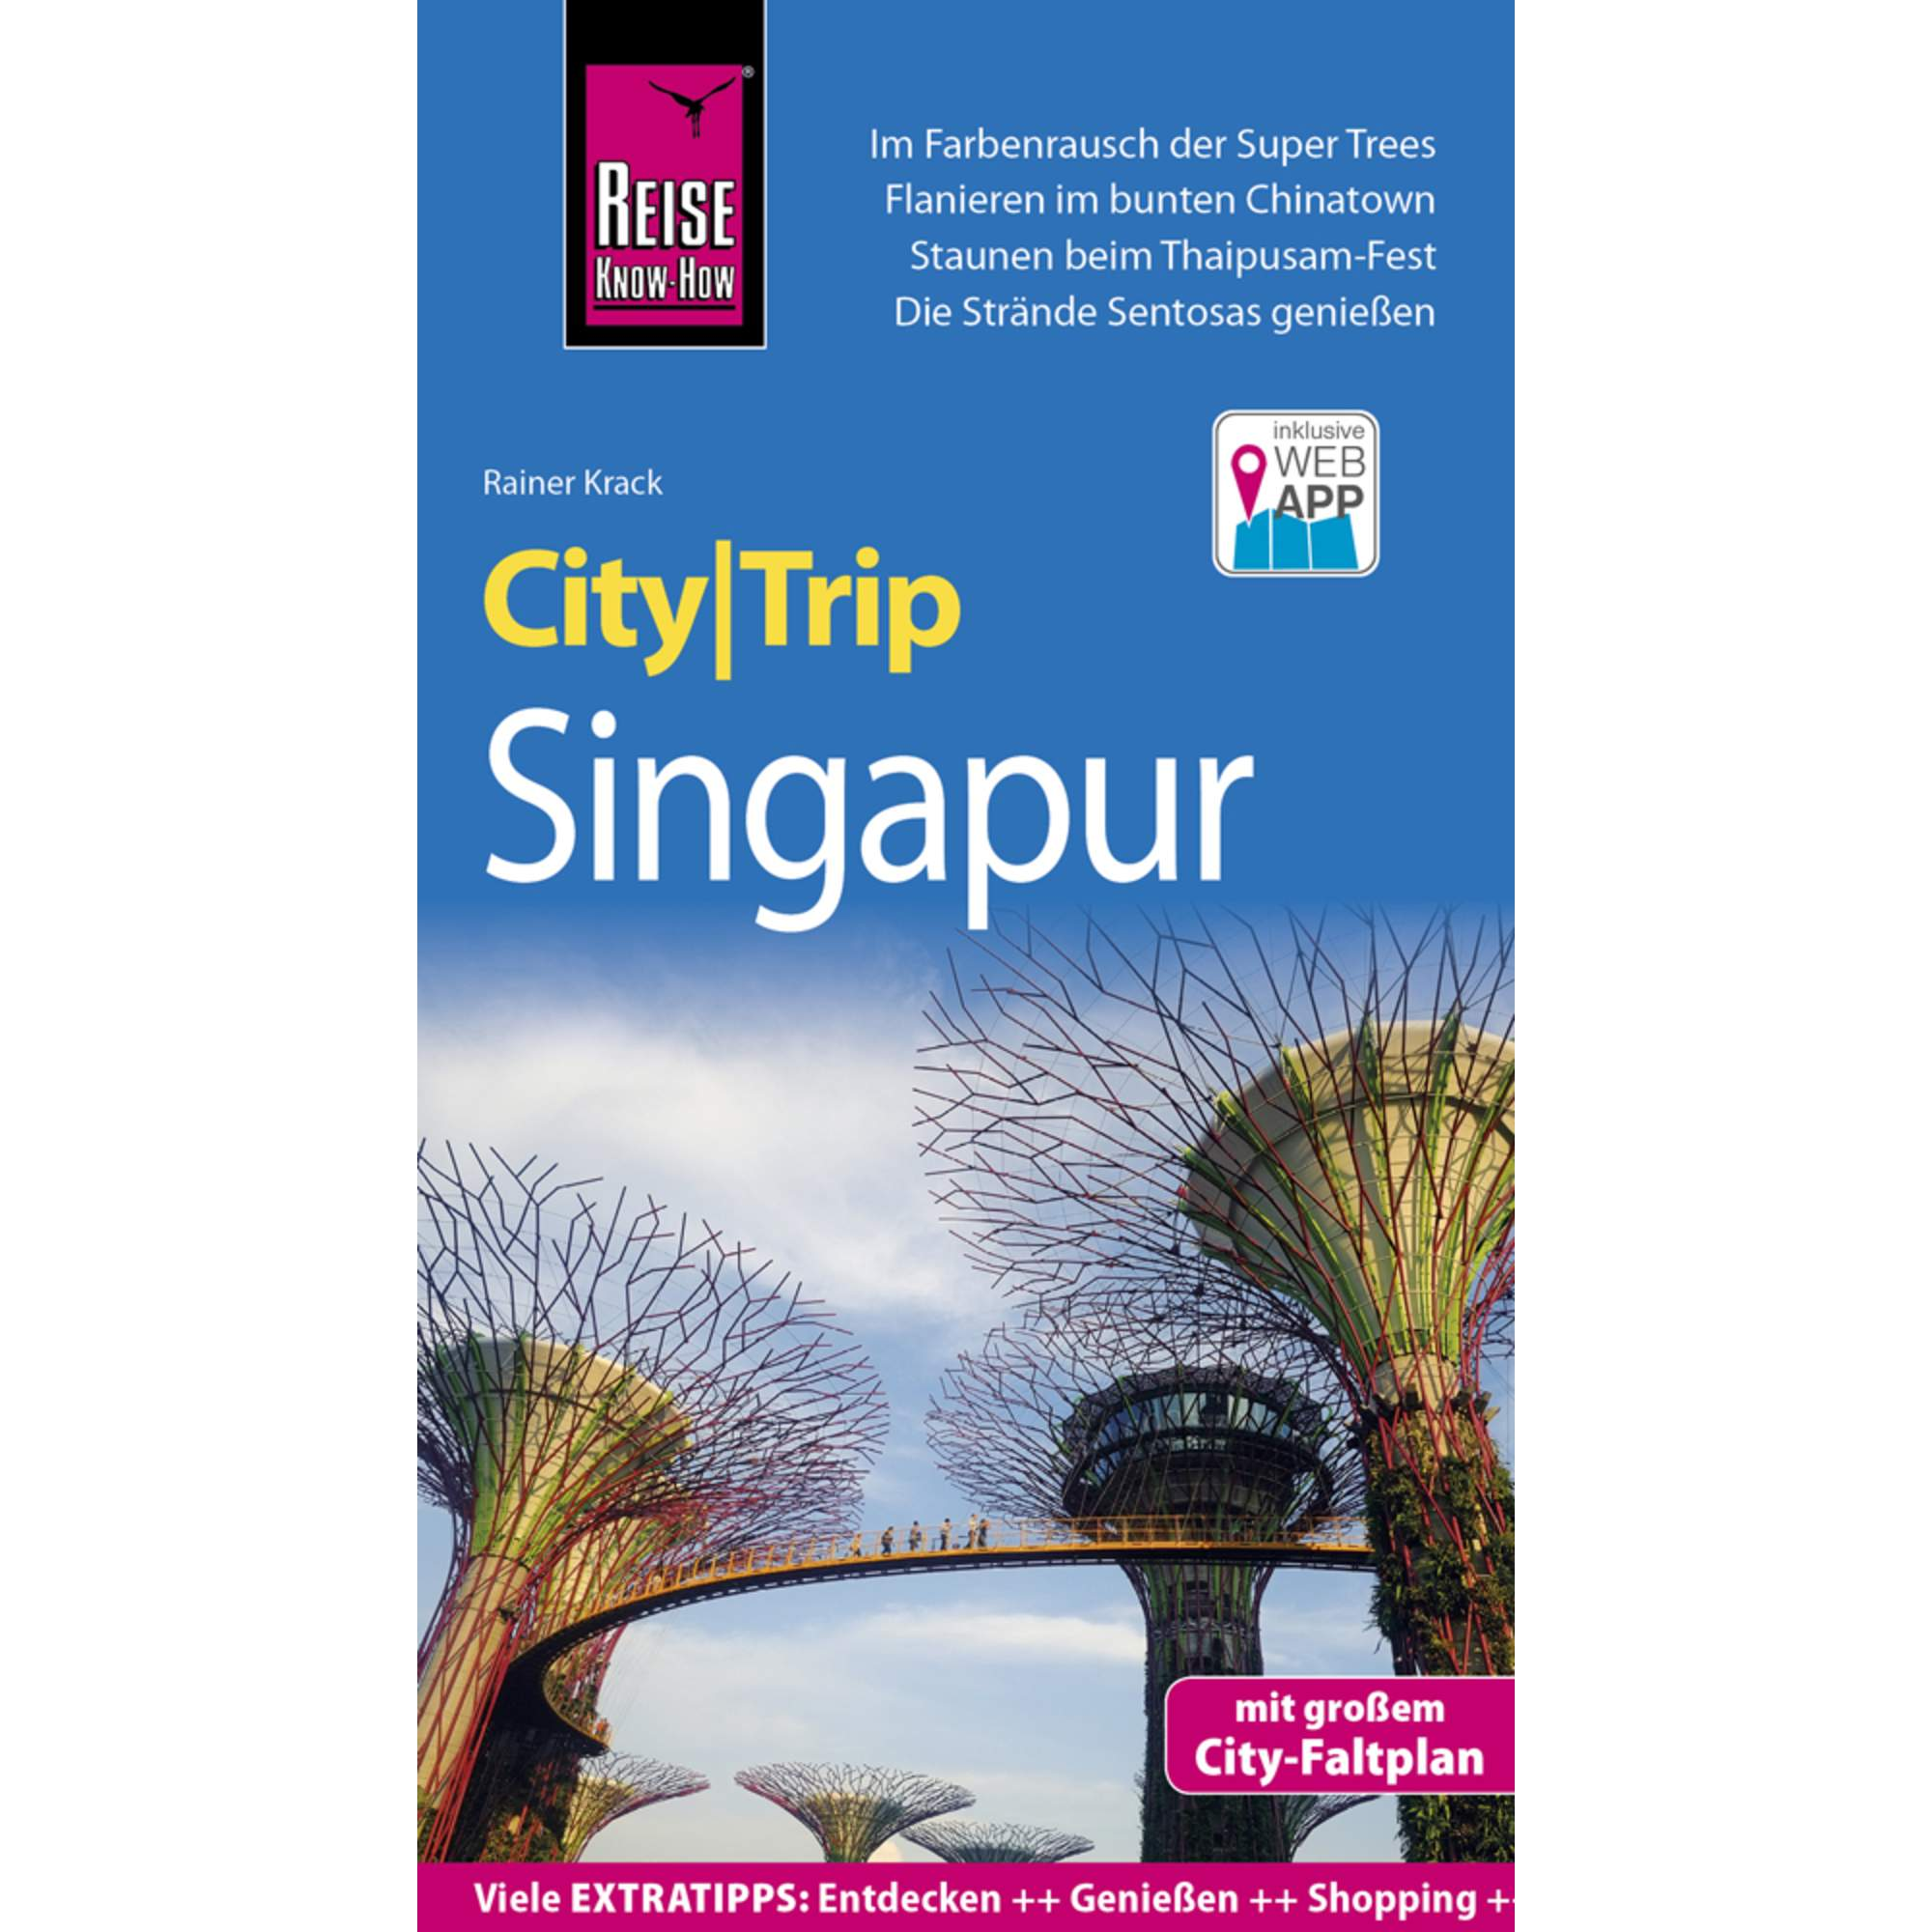 RKH CITYTRIP SINGAPUR, 11,95 Euro